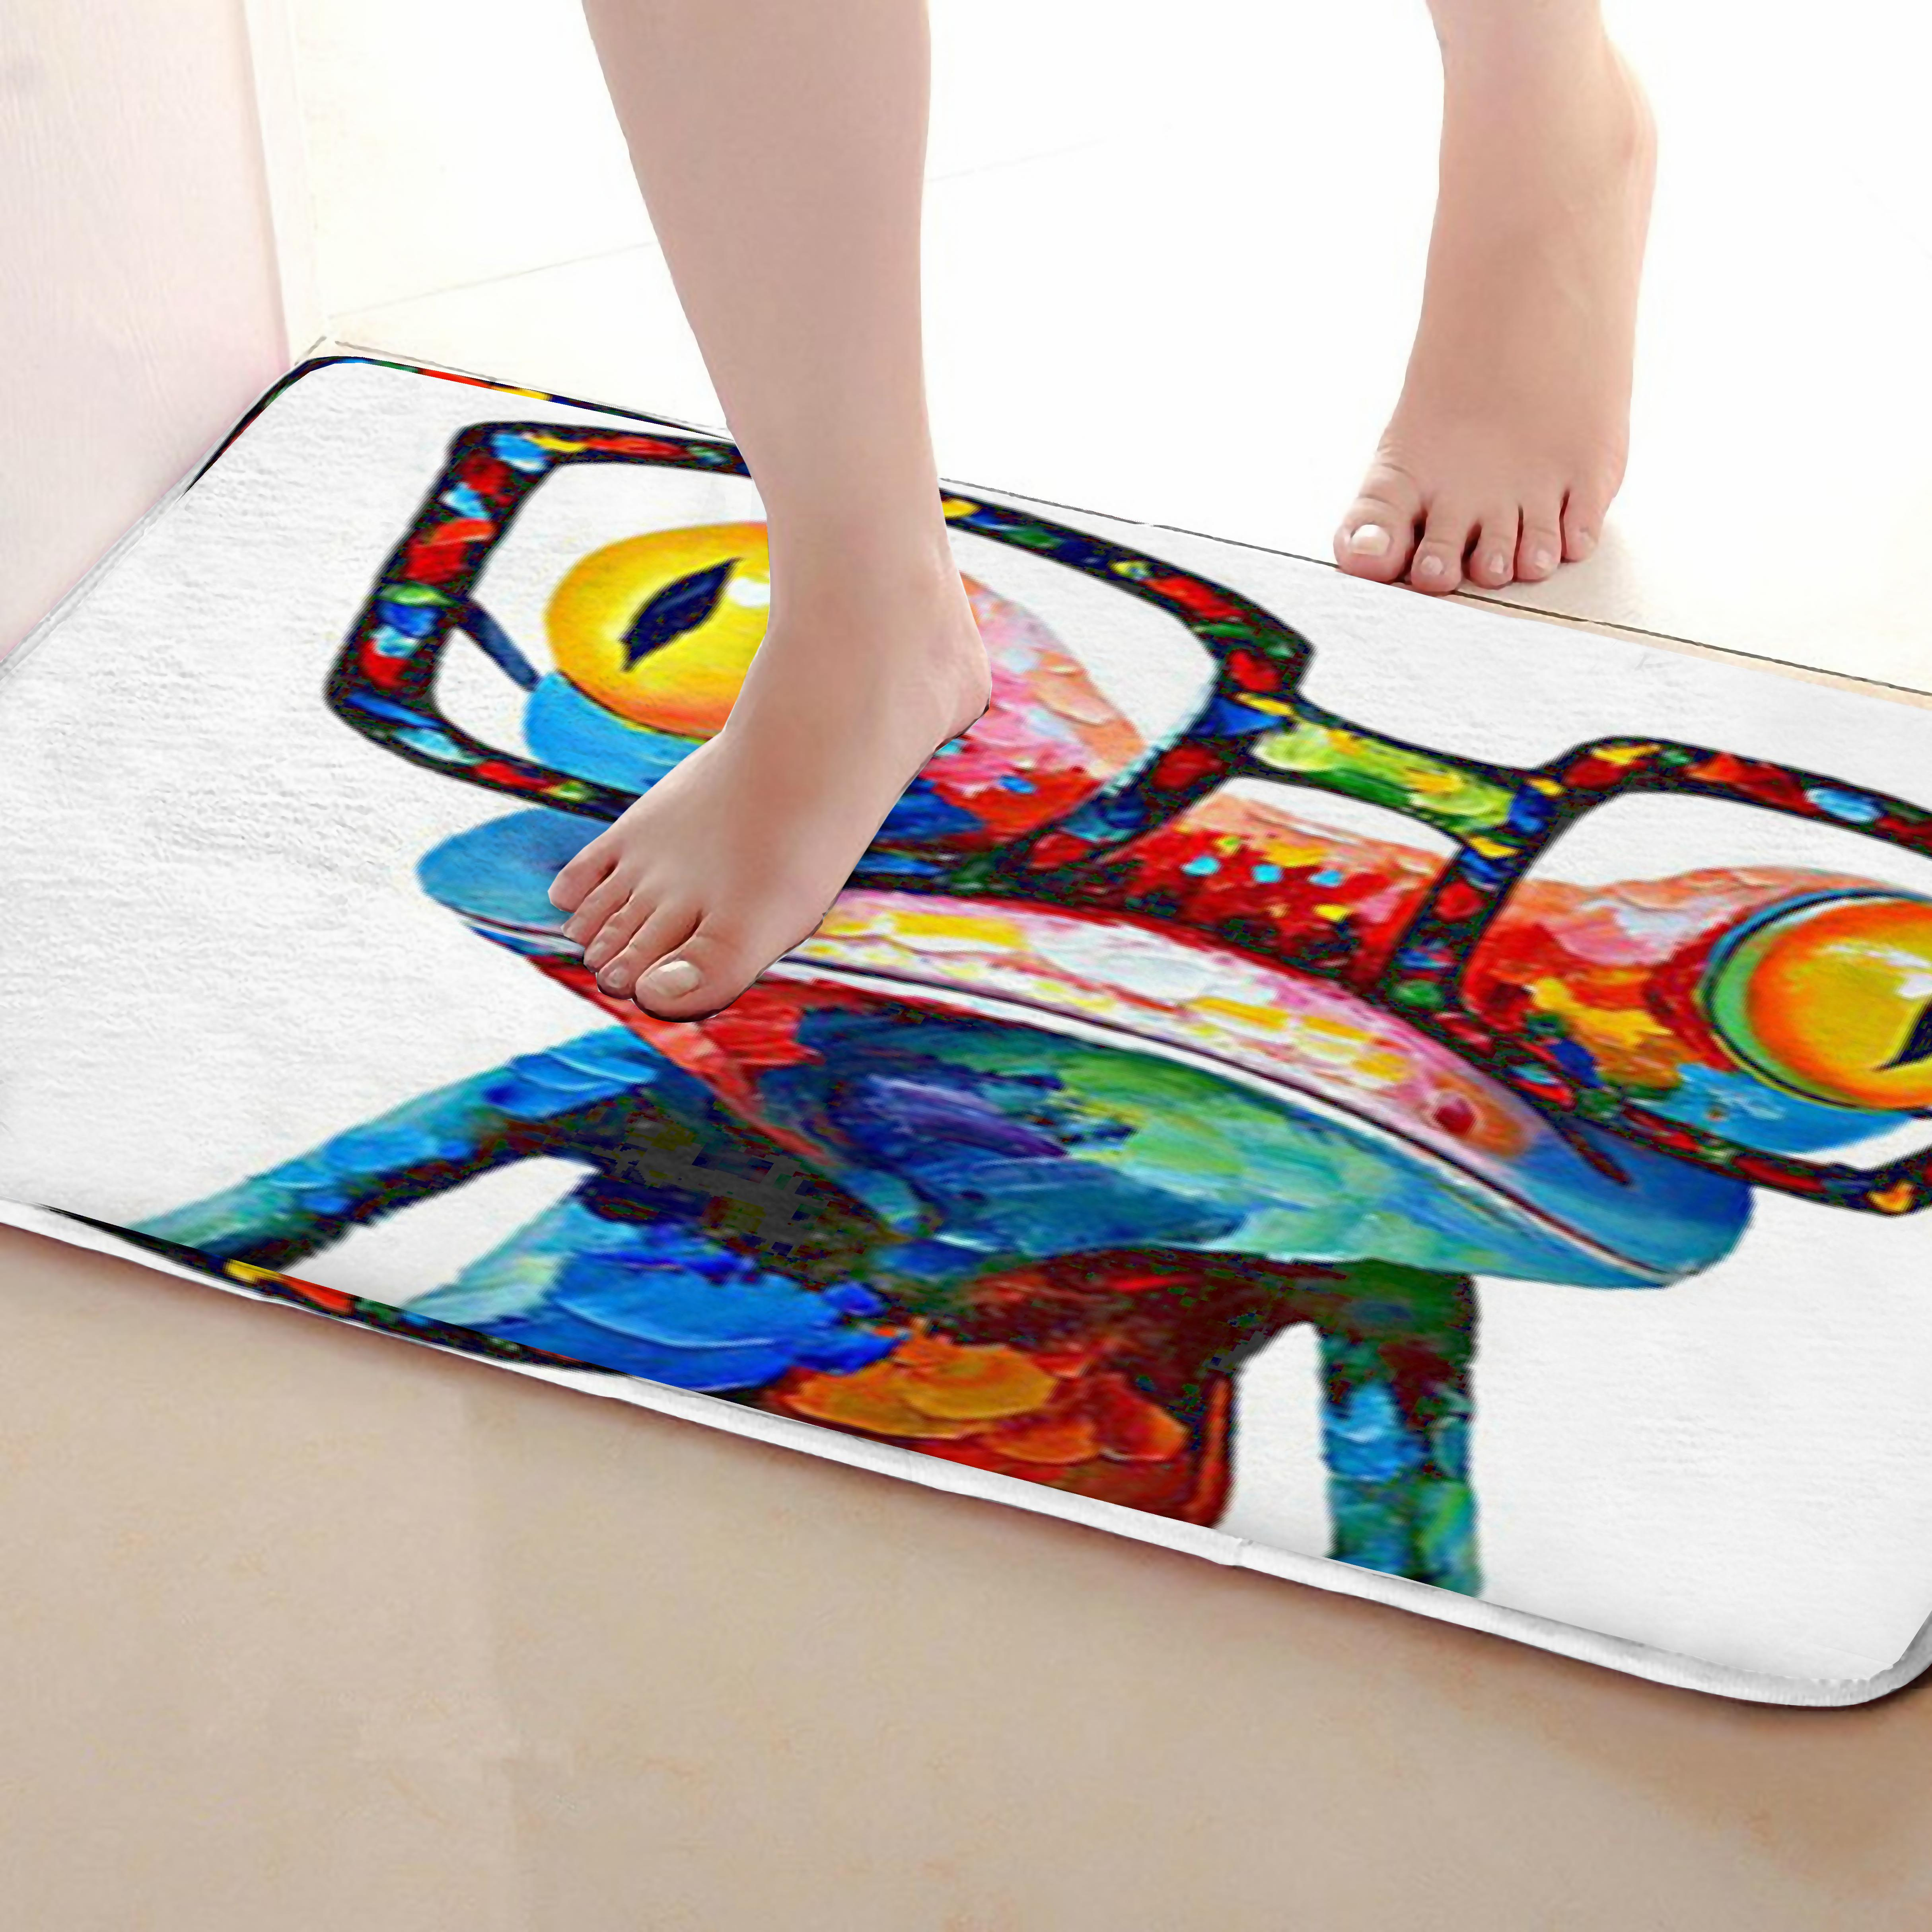 Frog Style Outdoor Mats,Funny Anti Skid Bath Mat, Doormats